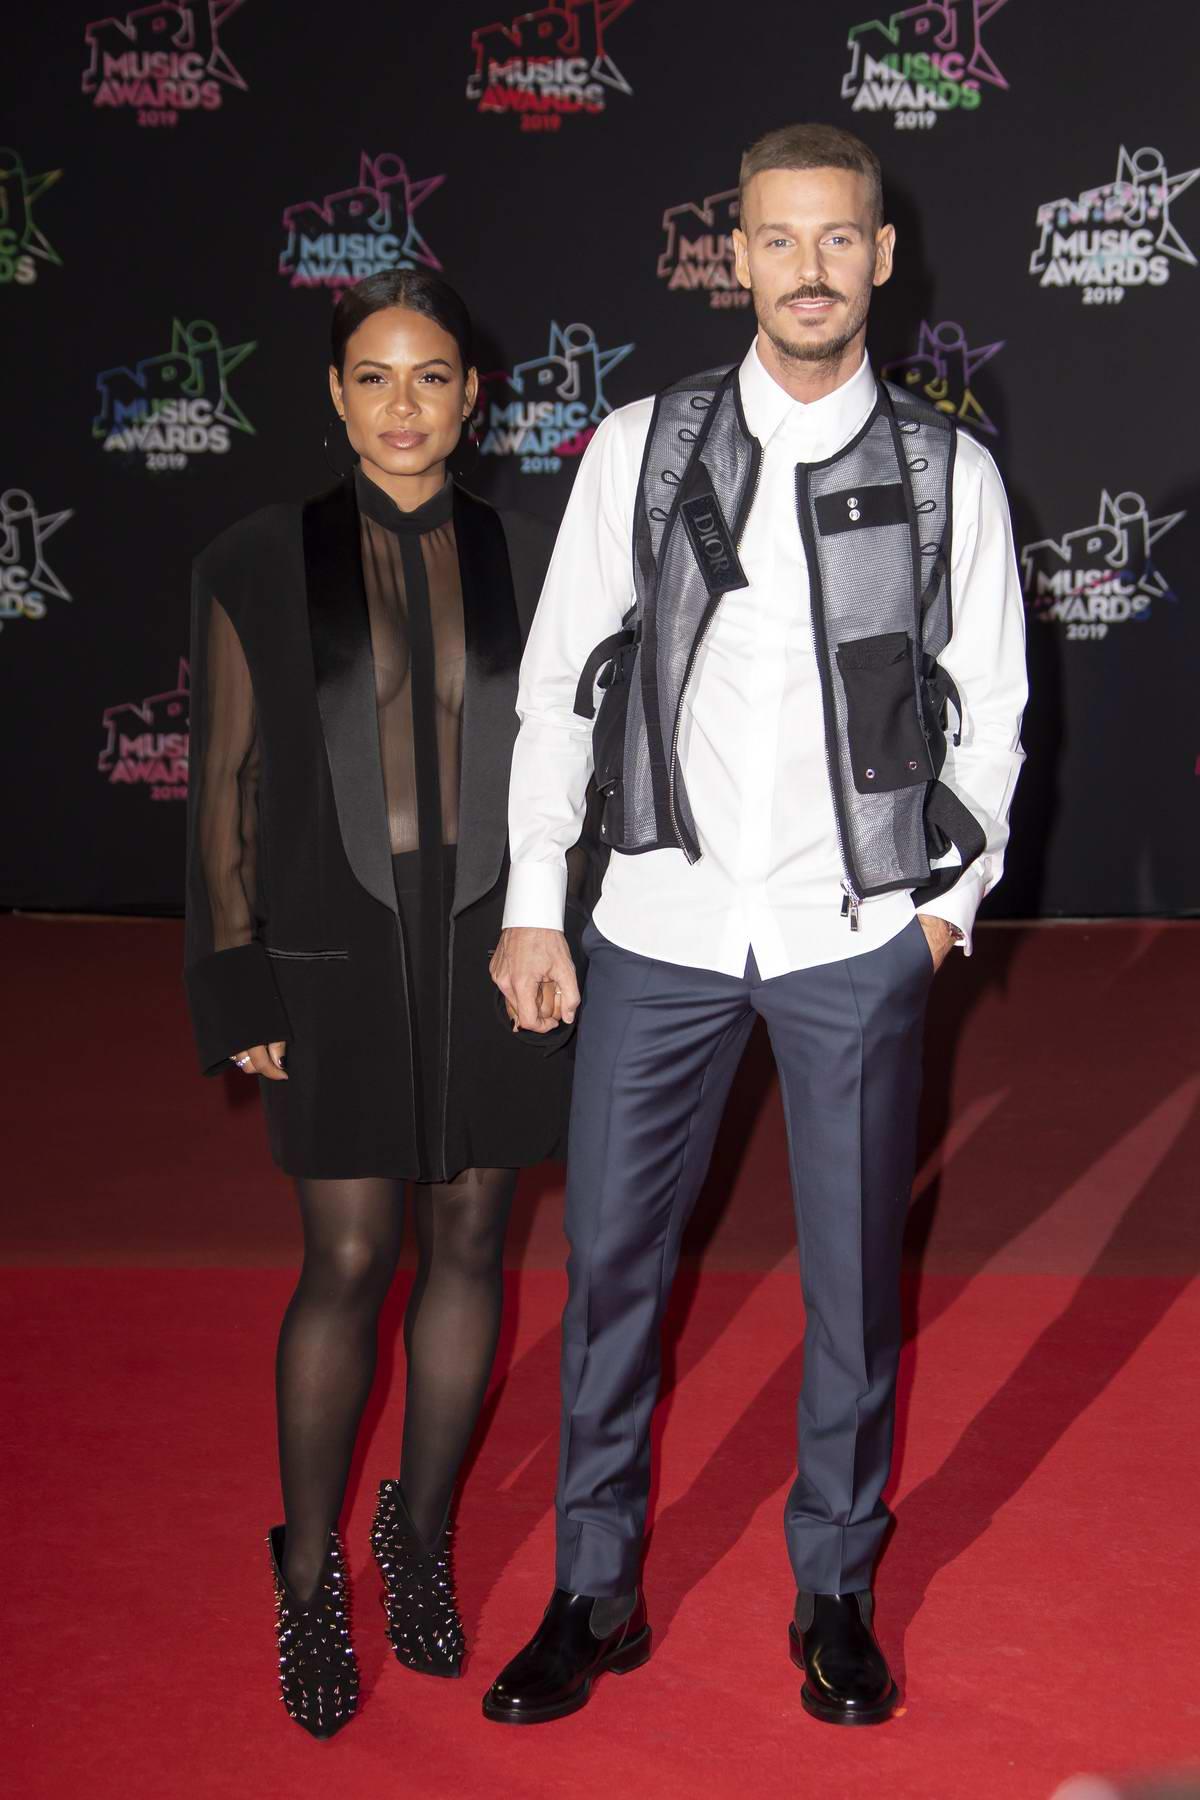 Christina Milian and Matt Pokora attend the 21st NRJ Music Awards in Cannes, France